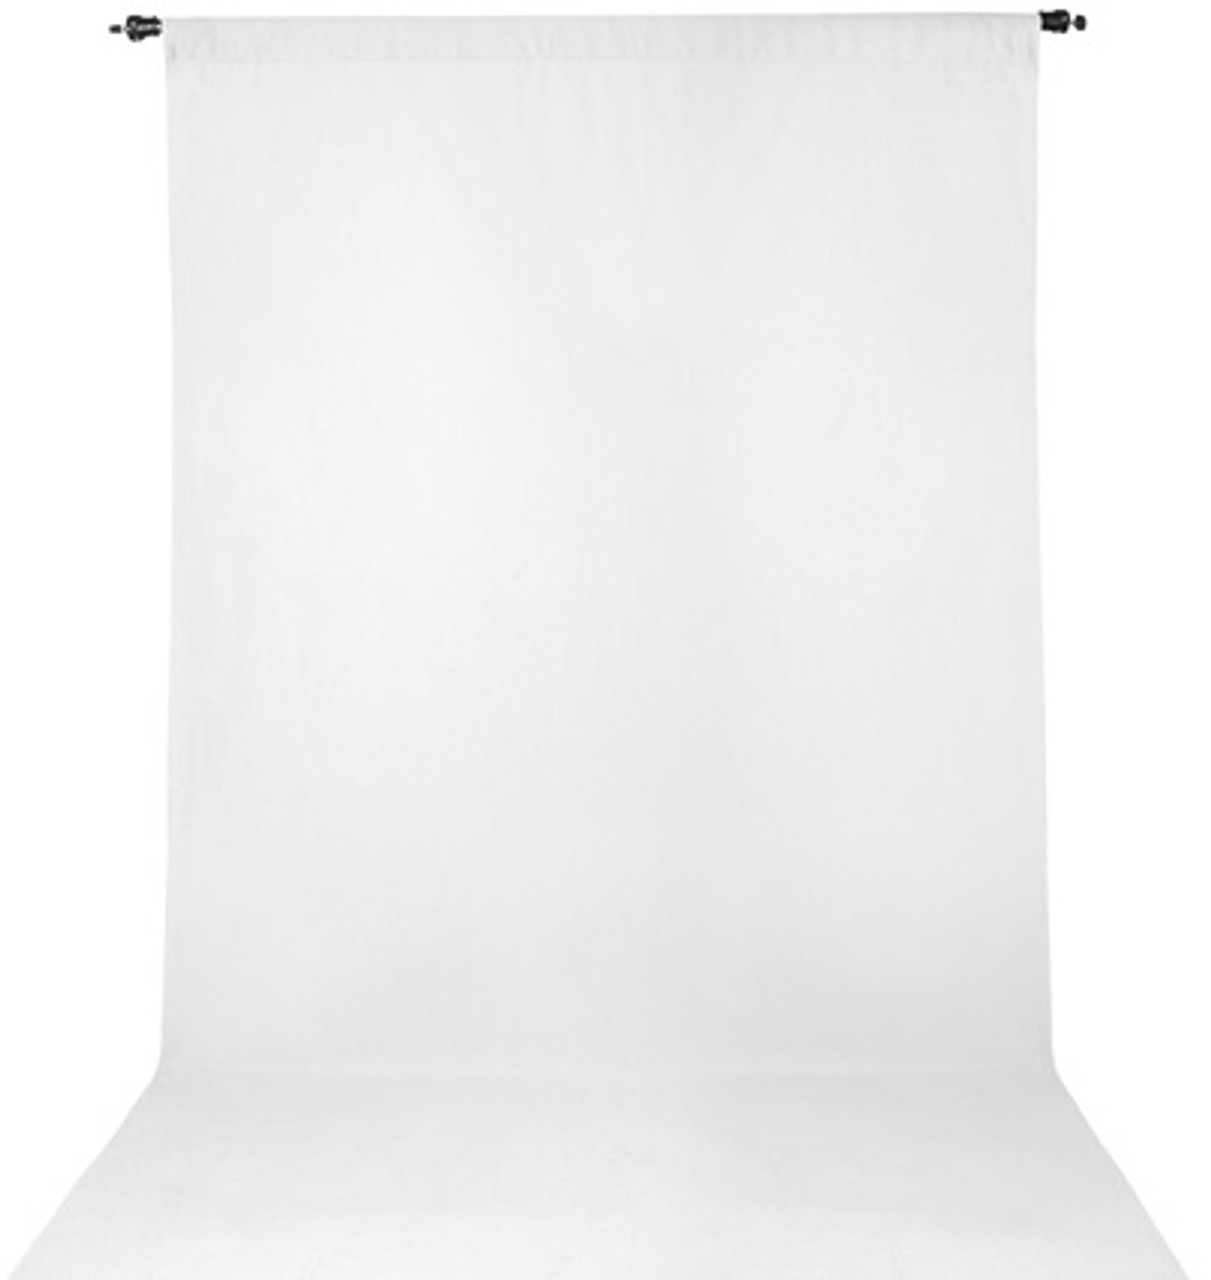 ProMaster Wrinkle Resistant Backdrop 10'x20' - White #2981